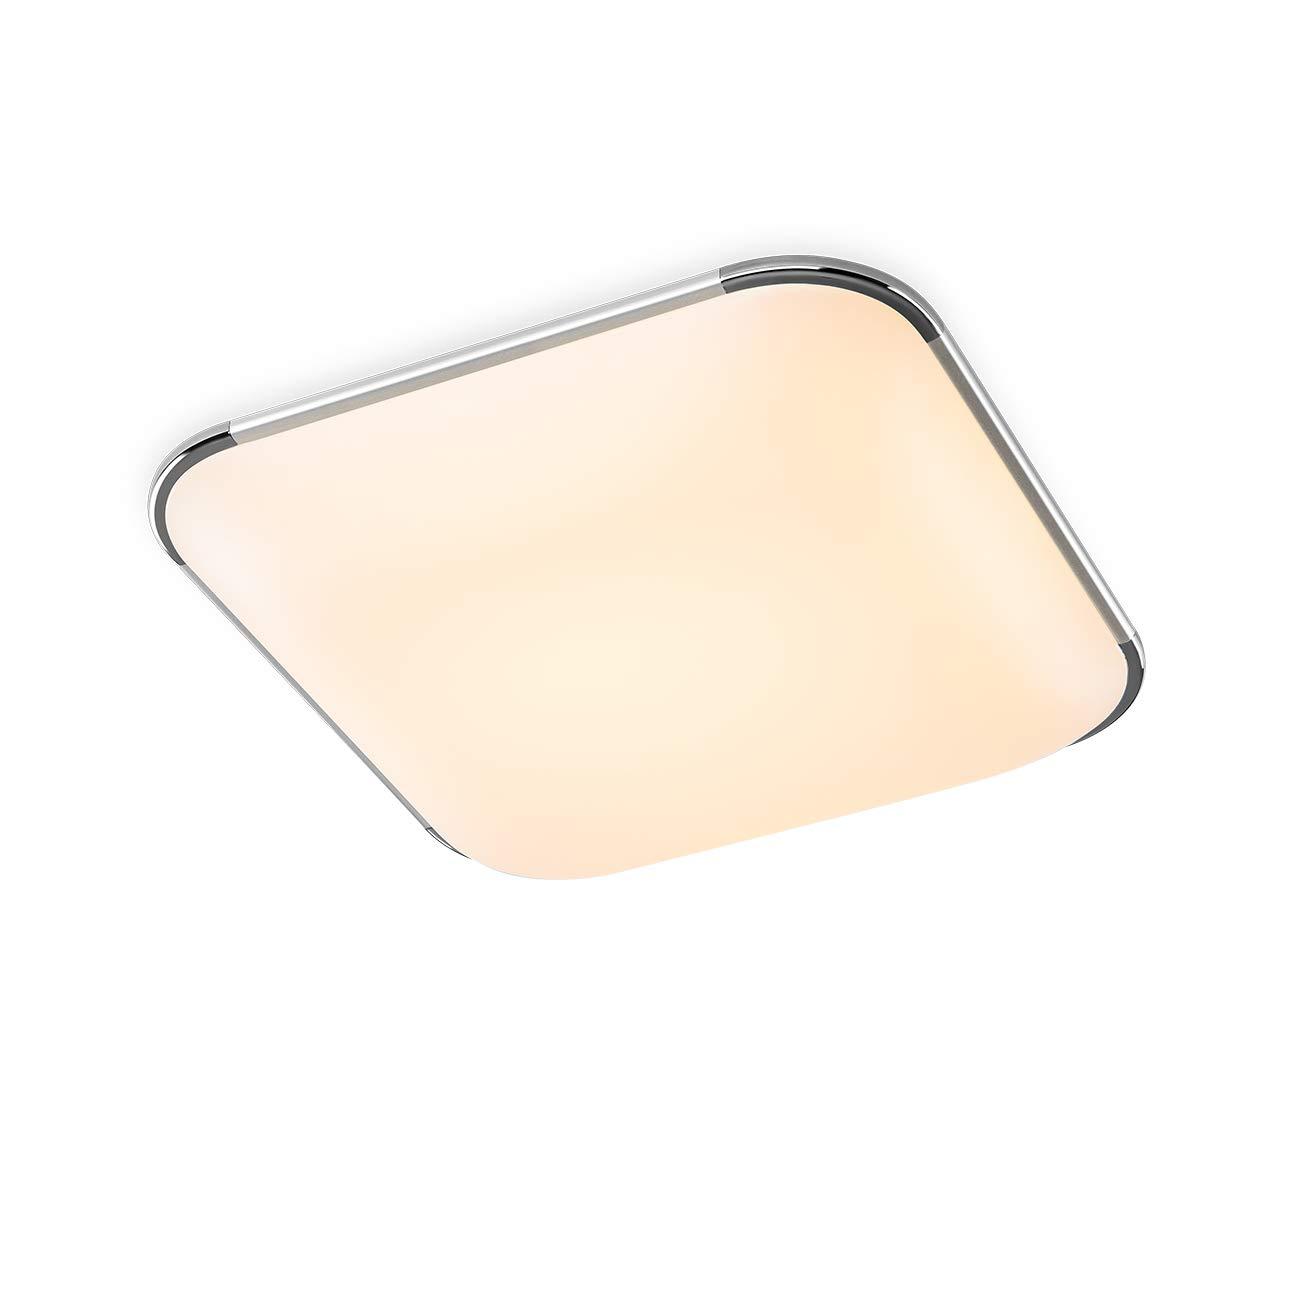 LVWIT - Lampada Pannello LED 118W Dimmerabile - Forma Quadrata (930mm*650mm) [Classe di efficienza energetica A++] AC009E-118W-dc